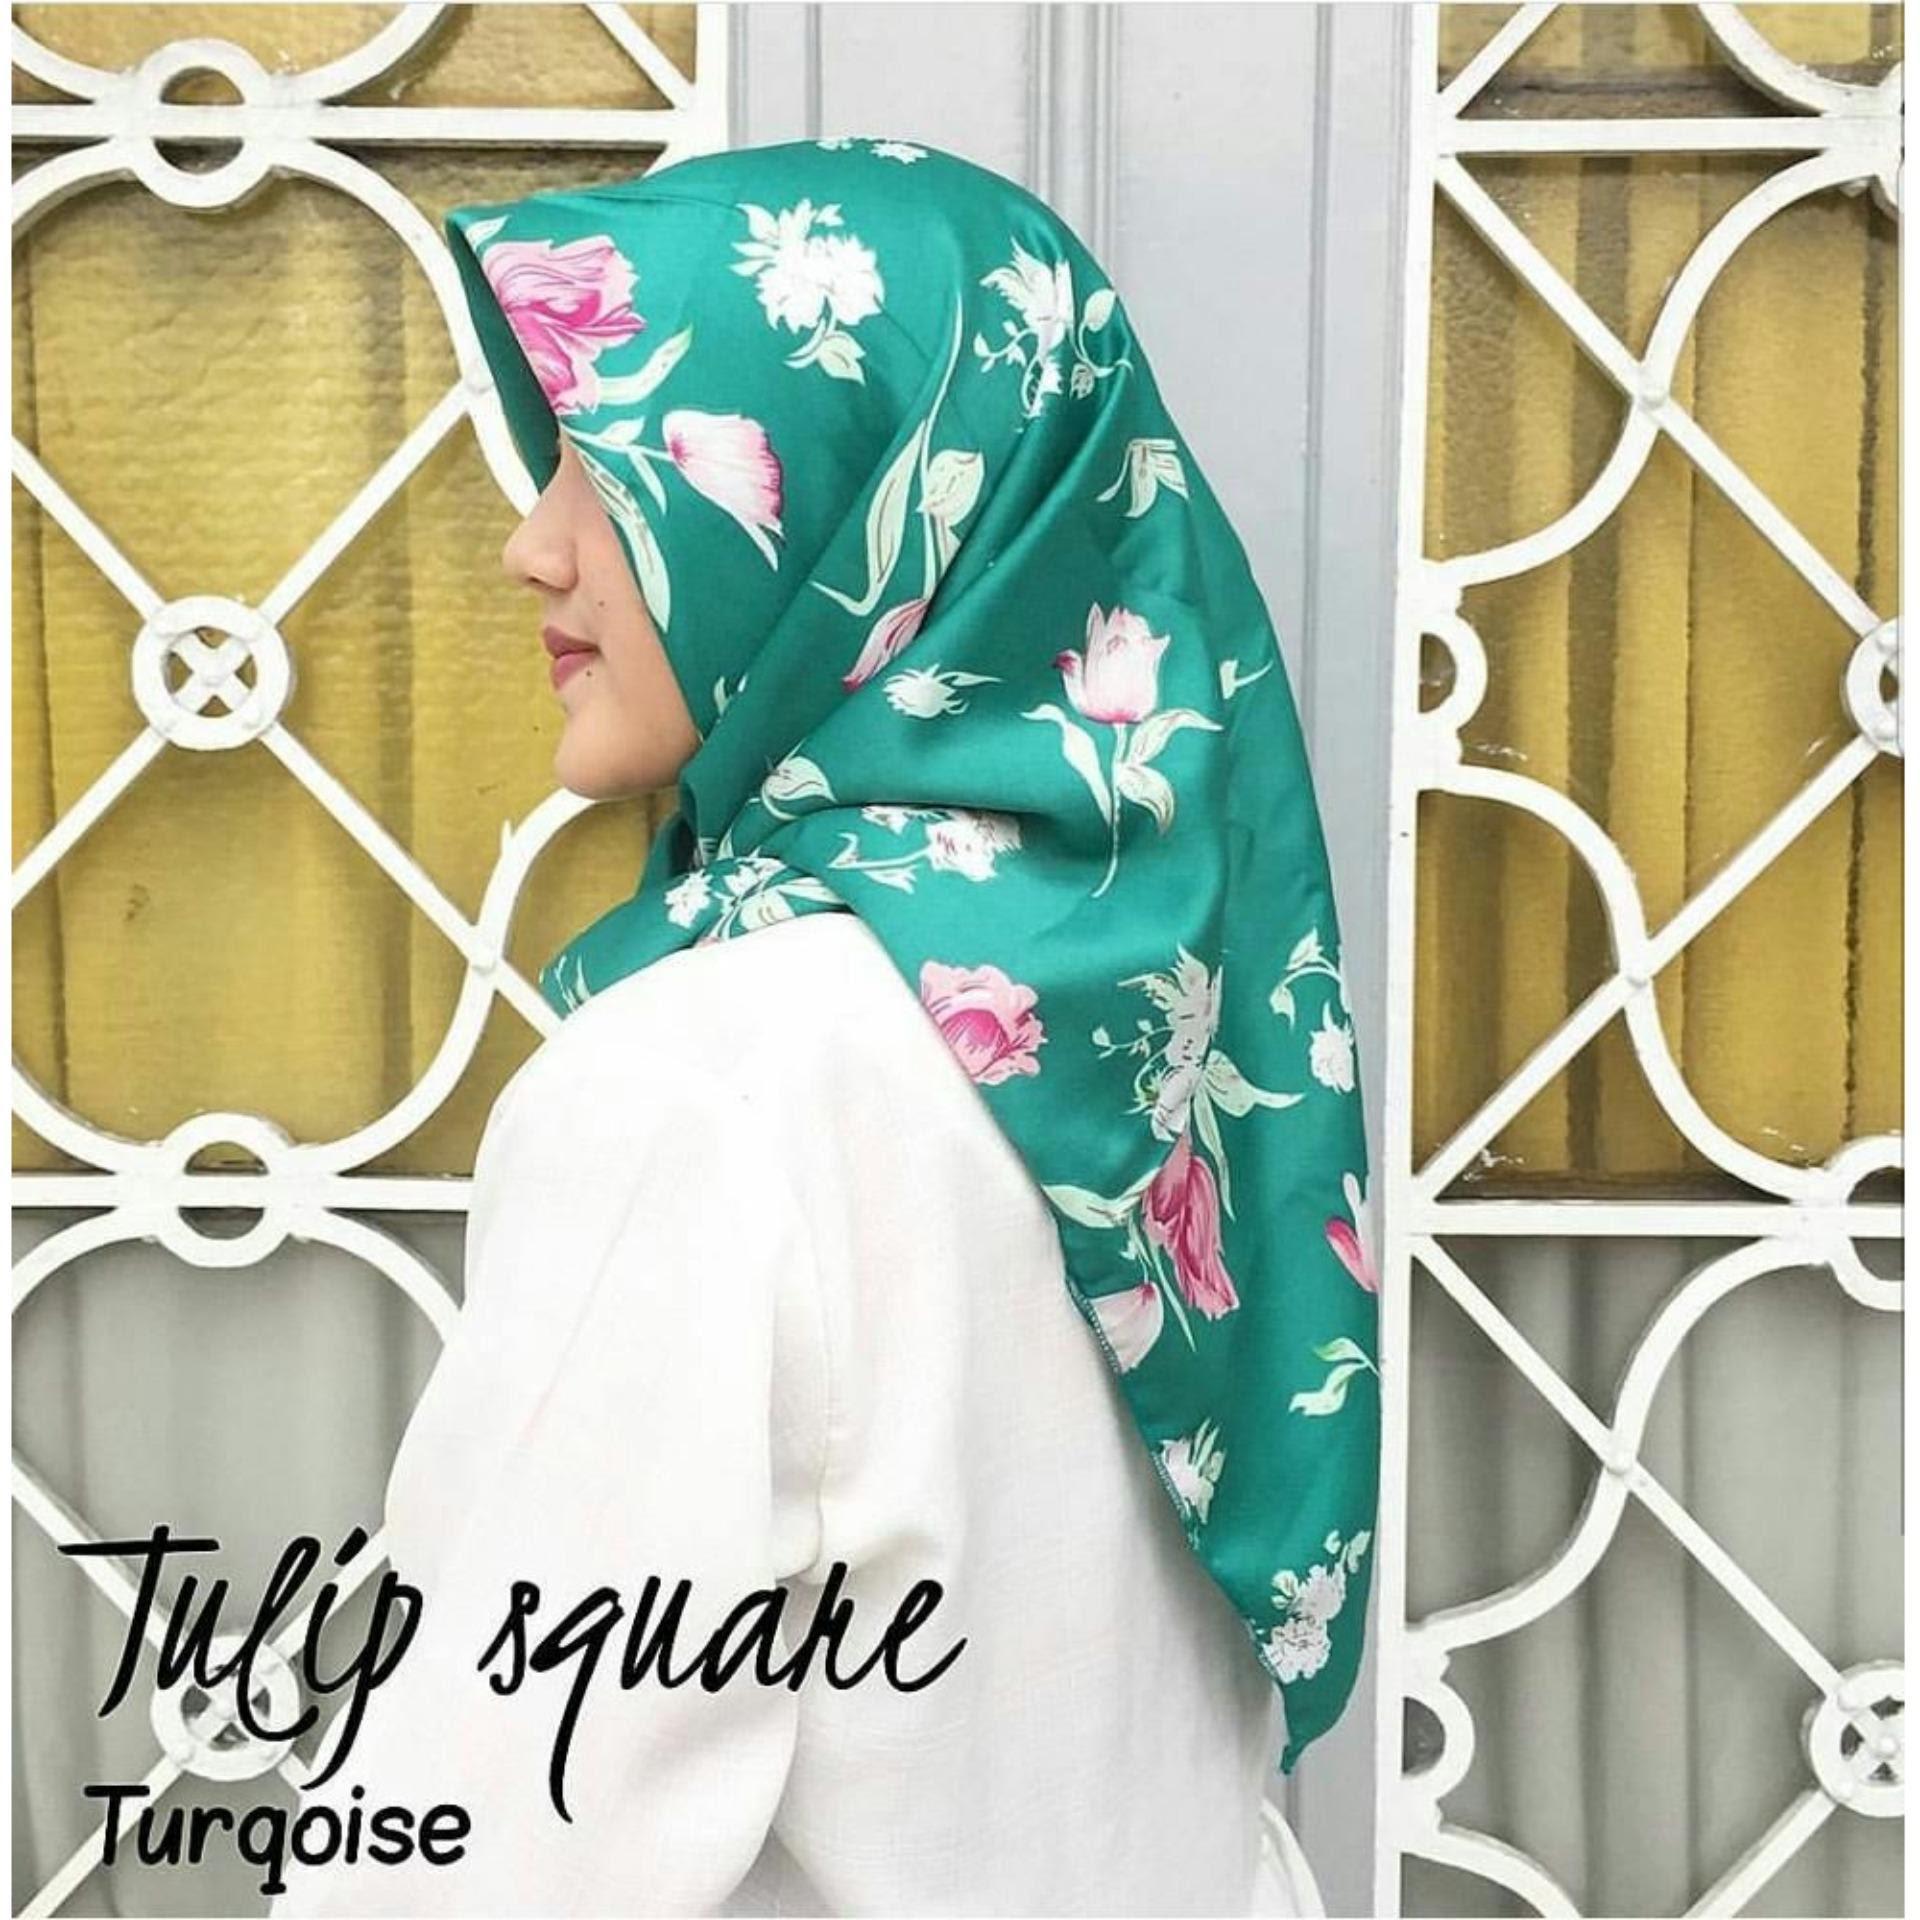 Beli Murah Harga Diskon Premium Jilbab Hijab Kerudung Instan Aisyah Serut Segi Empat Wolfis Motif Tulip Flower Square